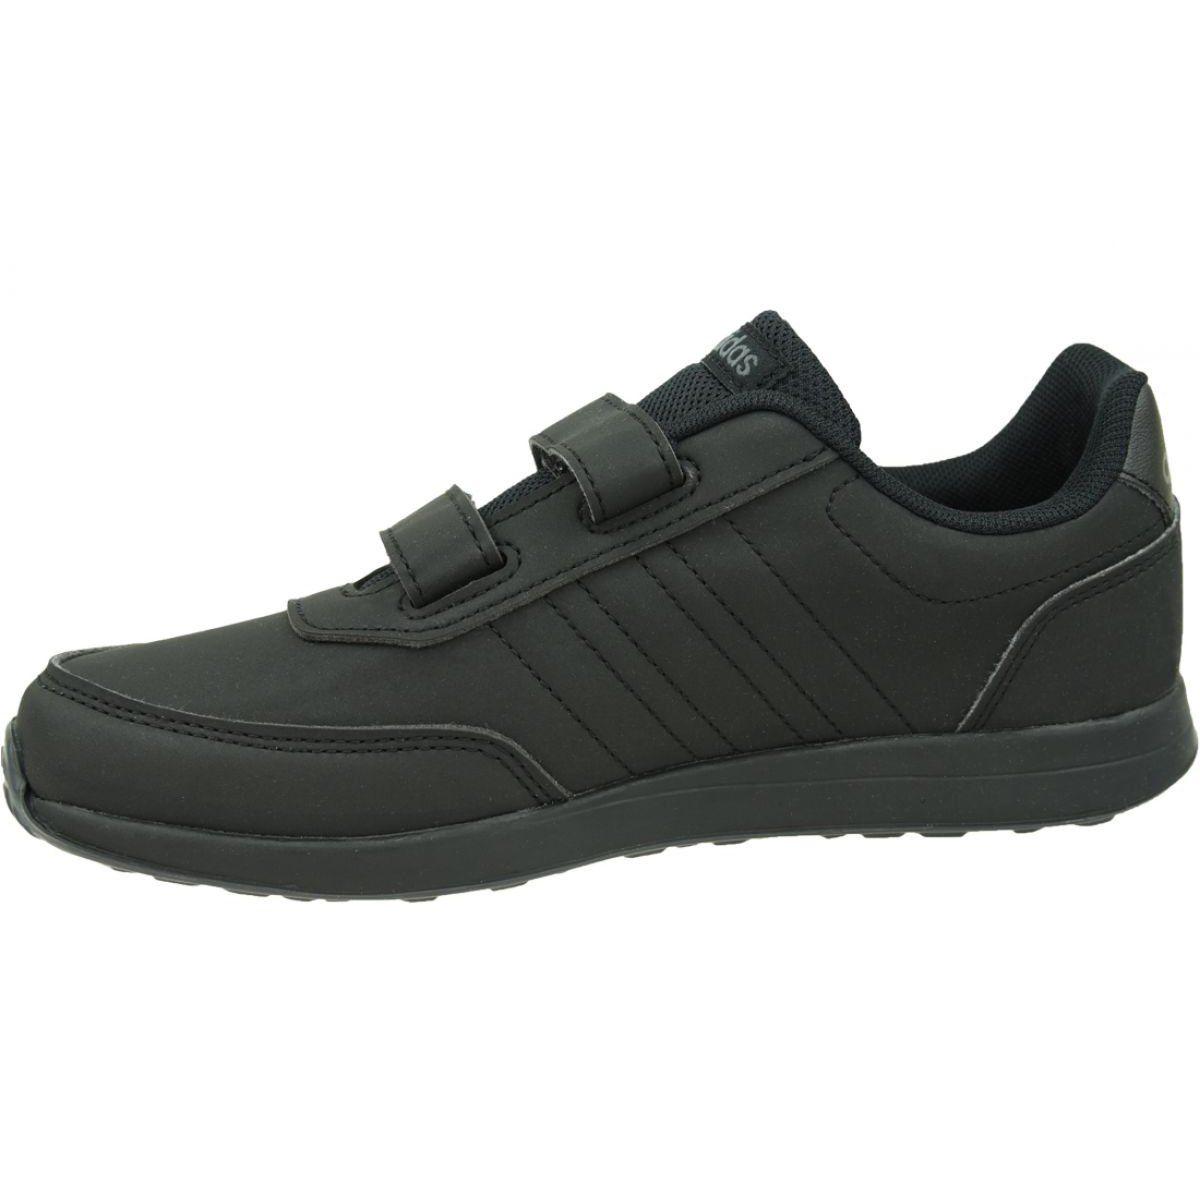 Buty Adidas Vs Switch 2 Cmf Jr Eg1595 Czarne Sports Shoes Adidas Black Shoes Shoes